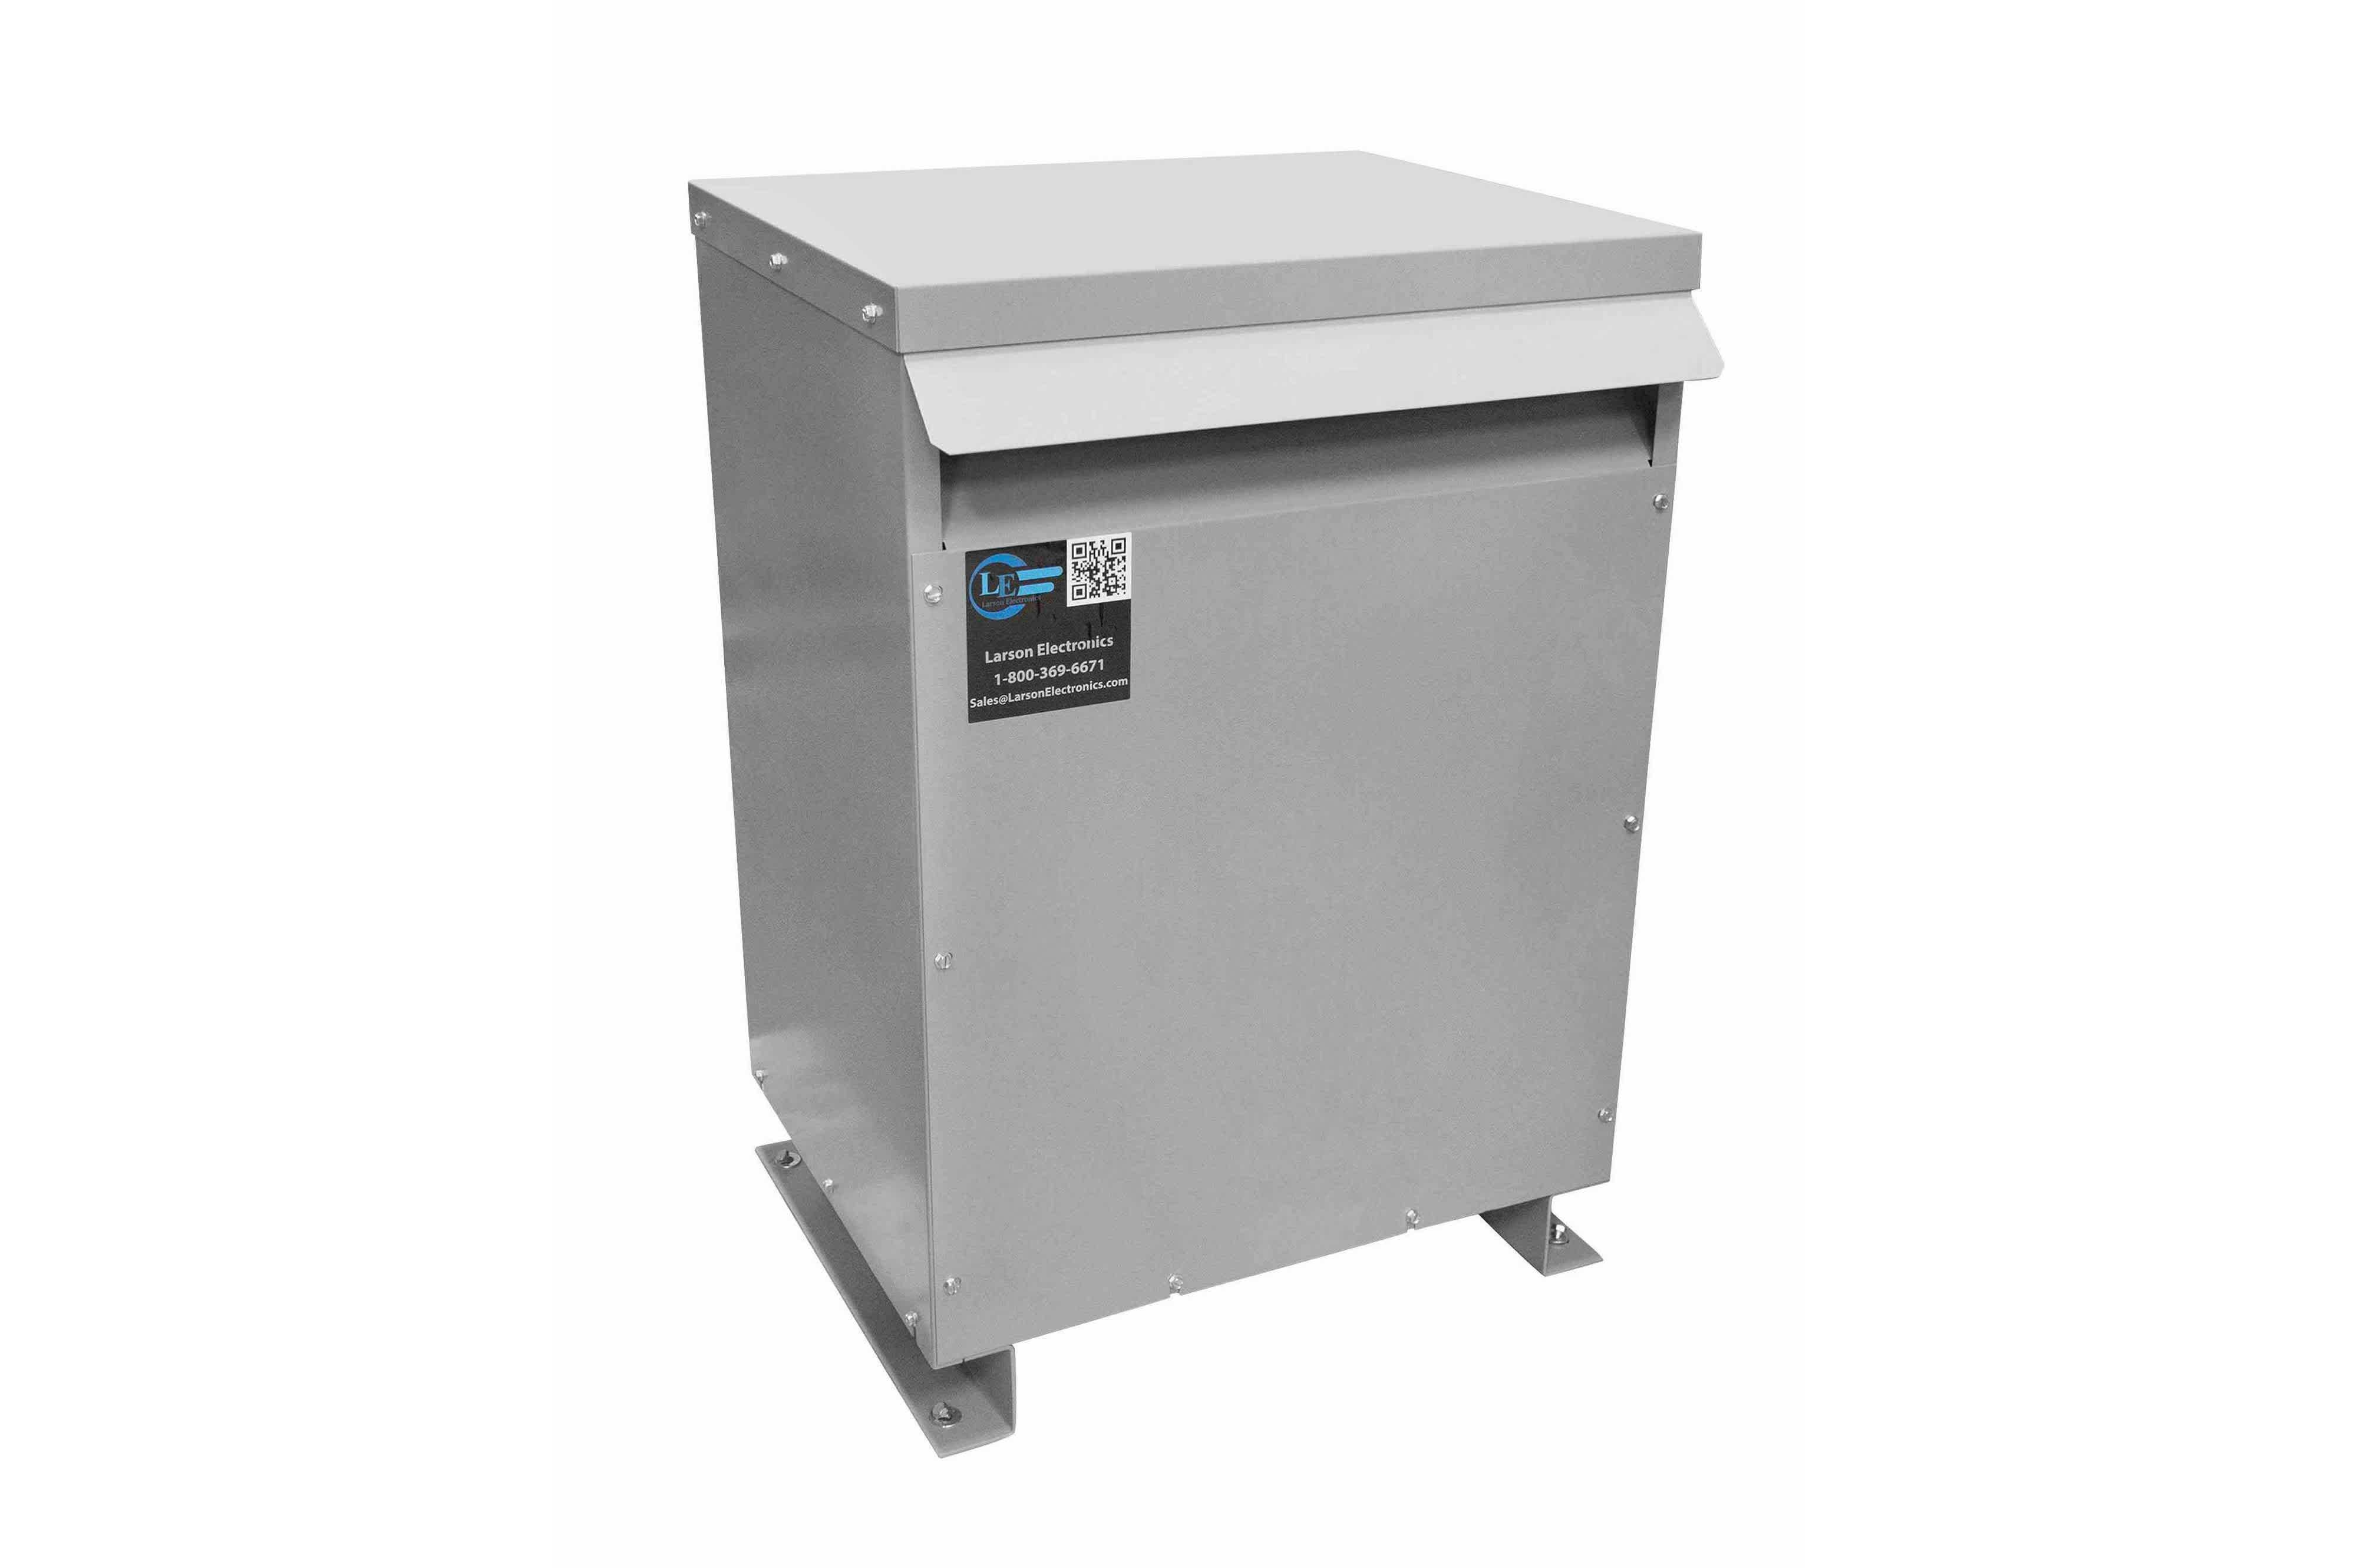 200 kVA 3PH Isolation Transformer, 600V Wye Primary, 208V Delta Secondary, N3R, Ventilated, 60 Hz